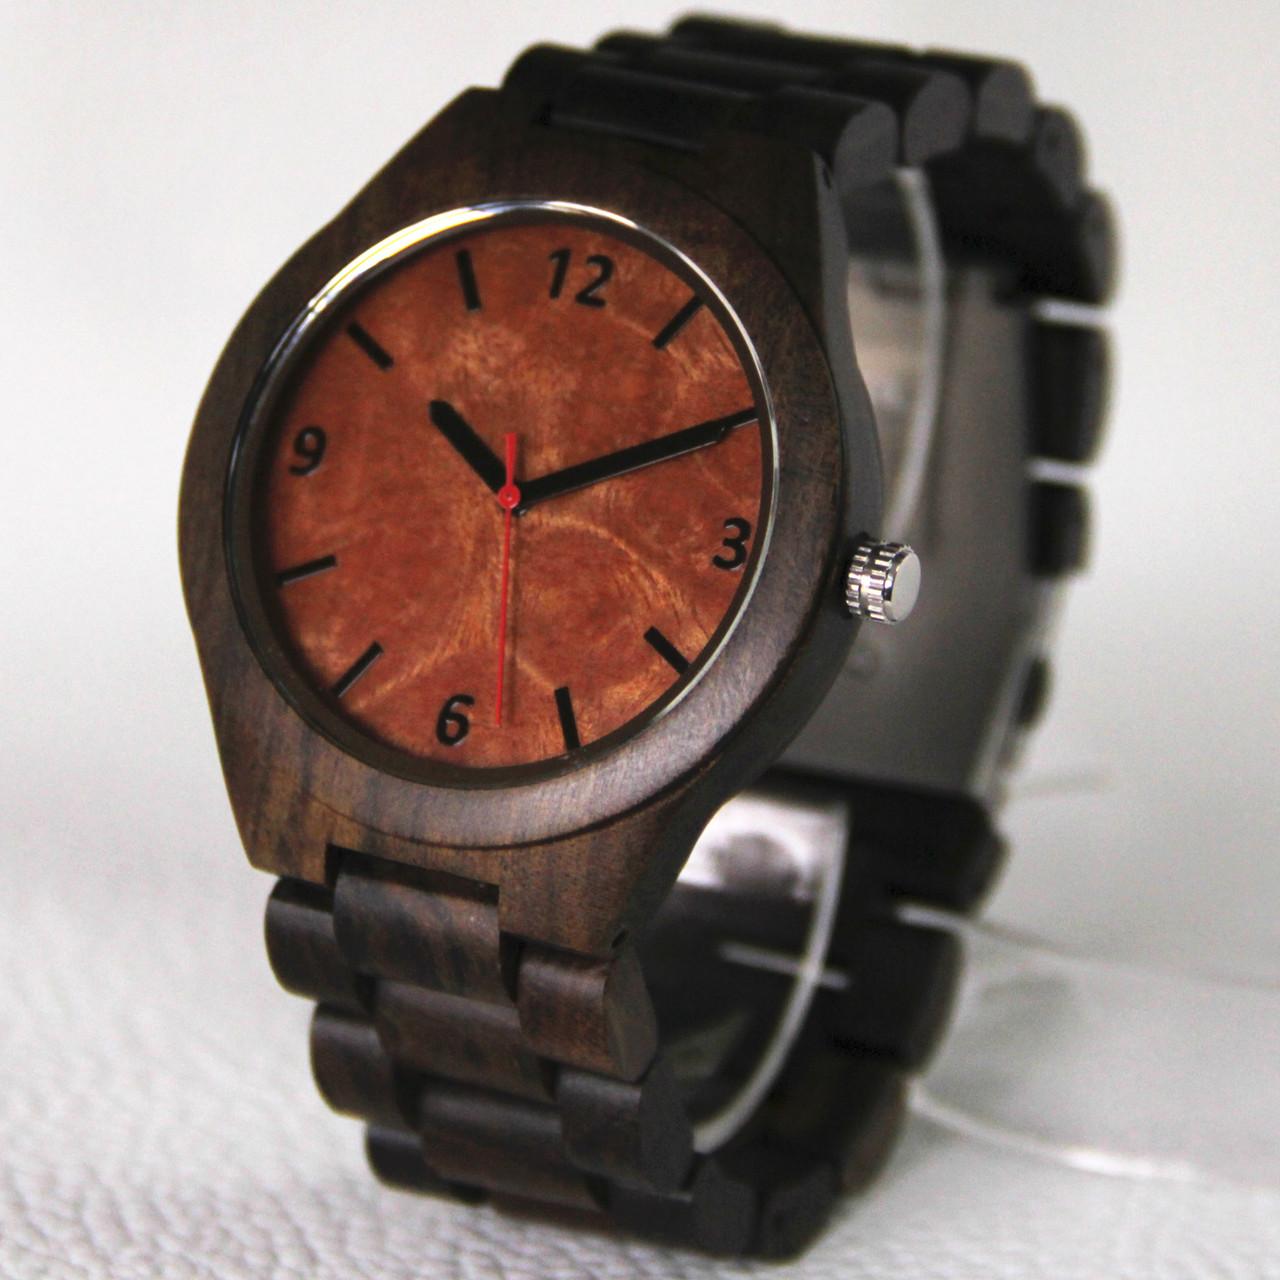 Grpn - Engraved Watch W#81